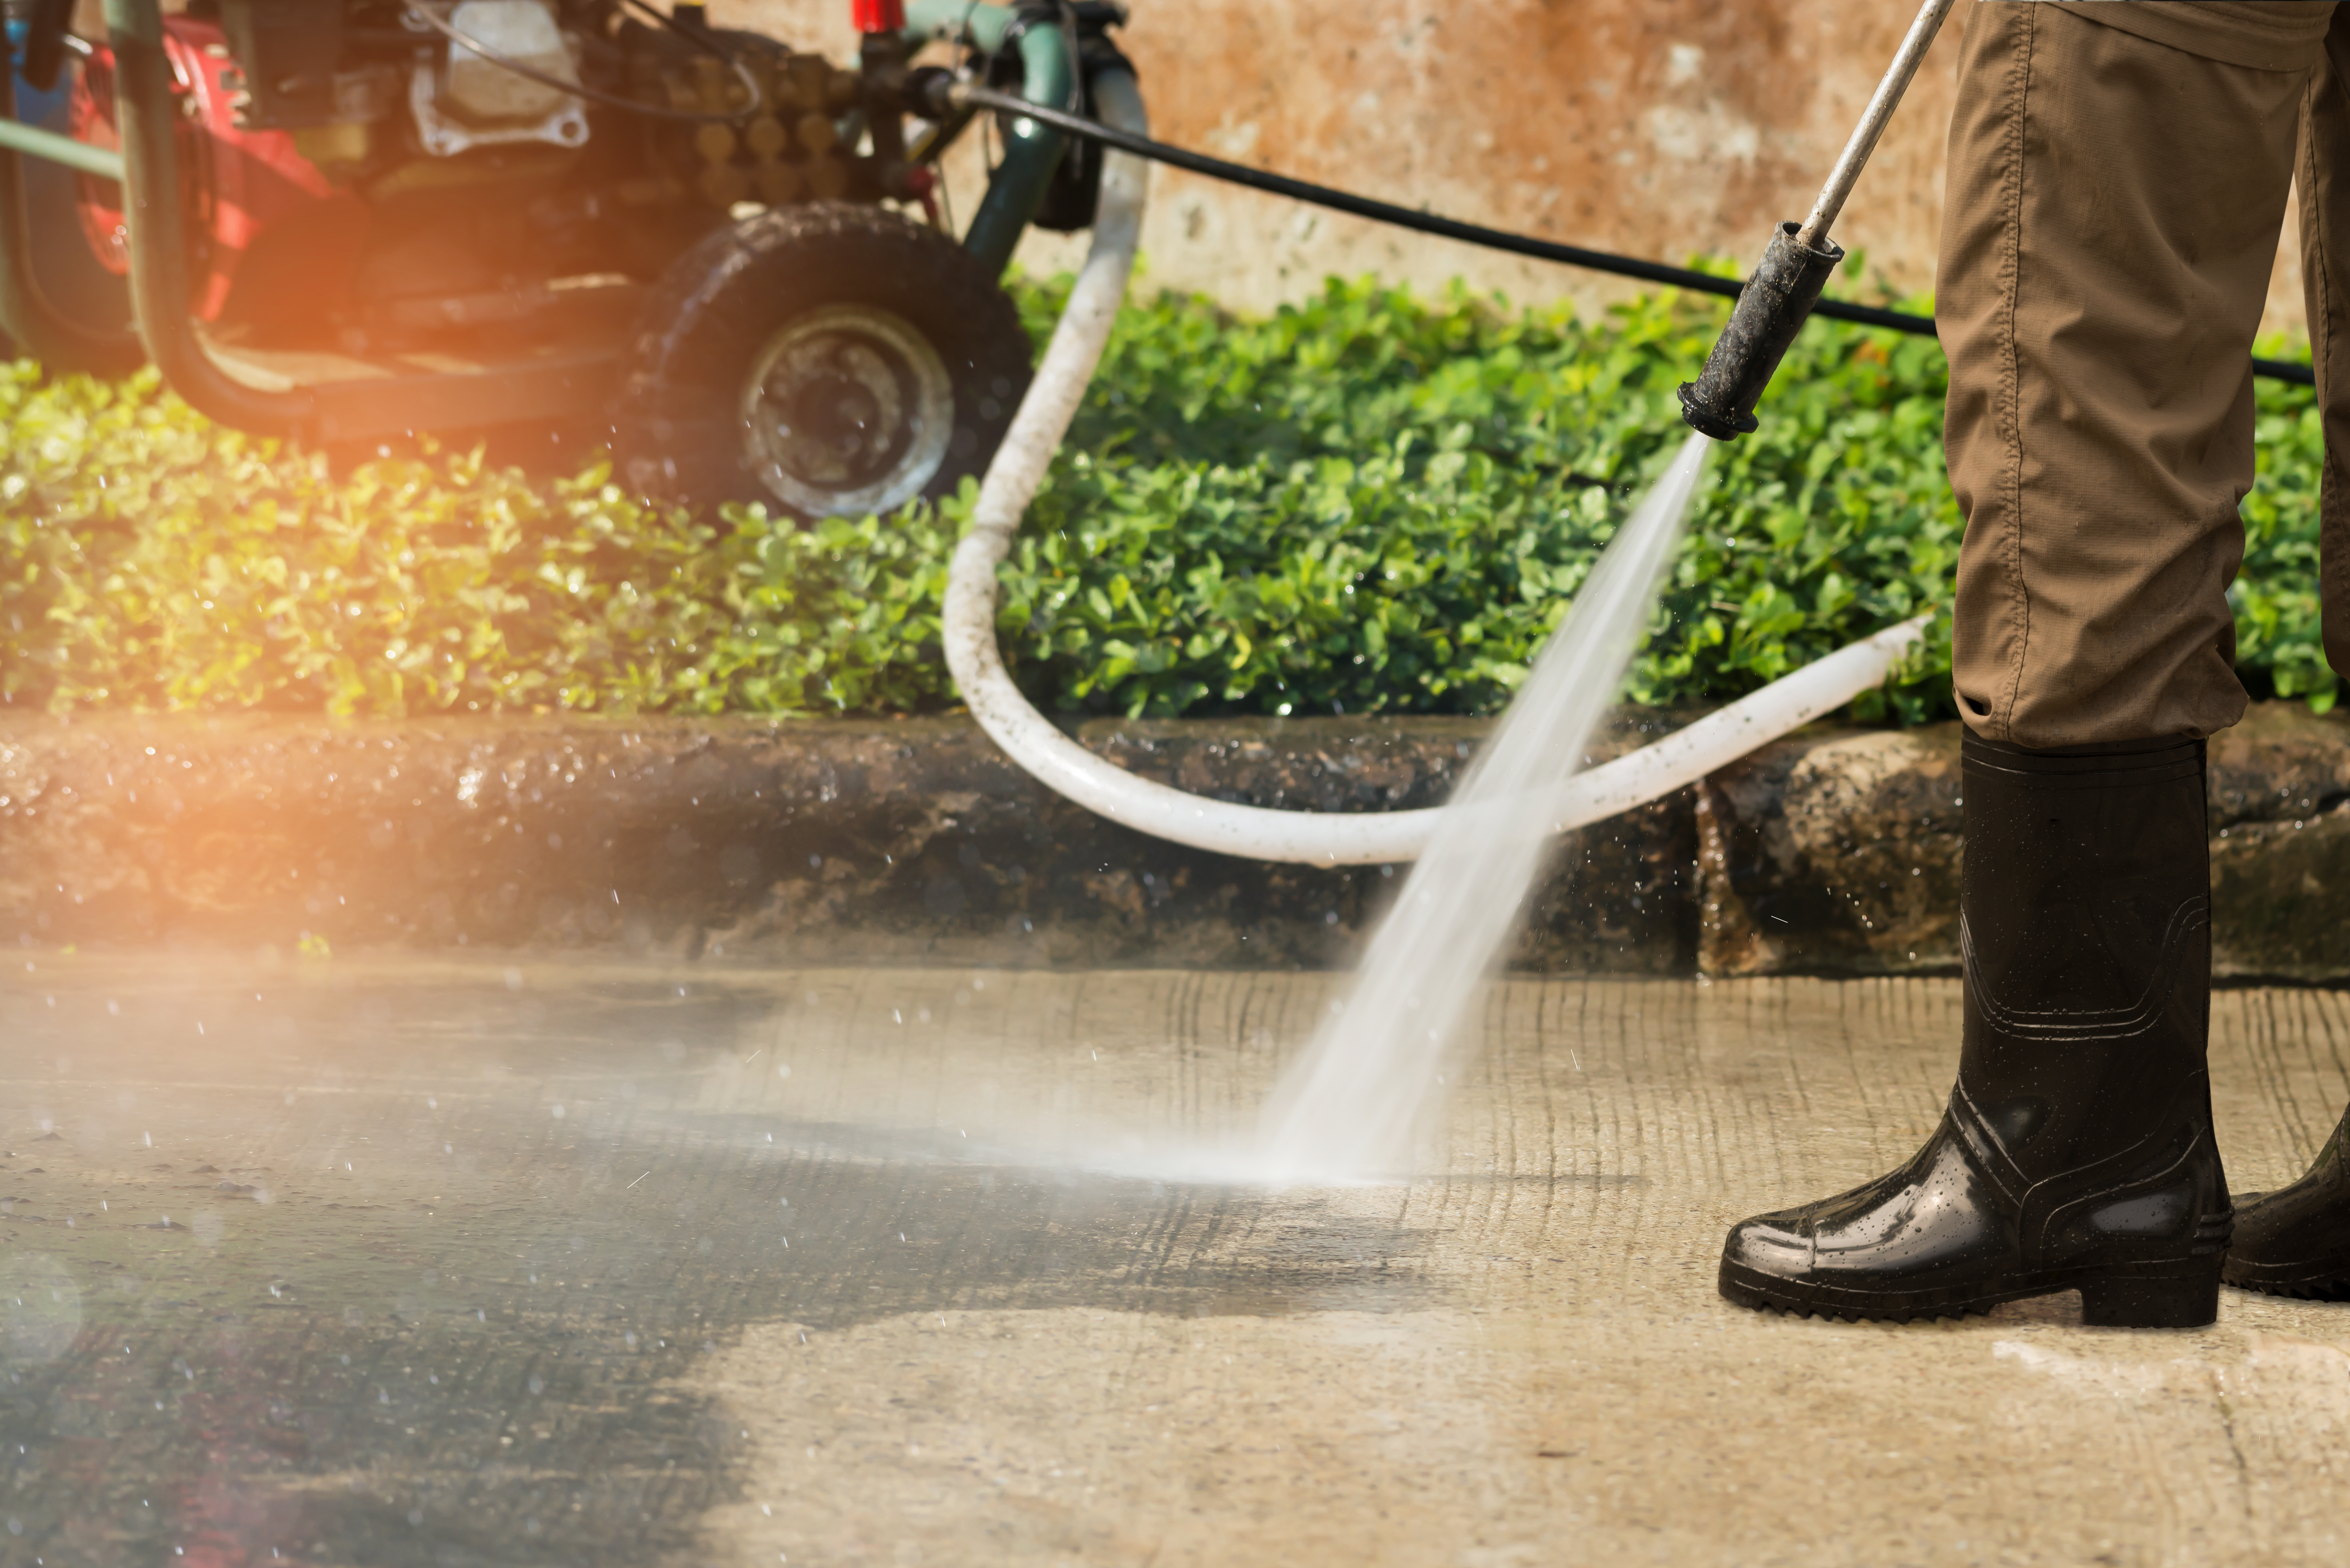 Industrial Cleaning Equipment Hamilton